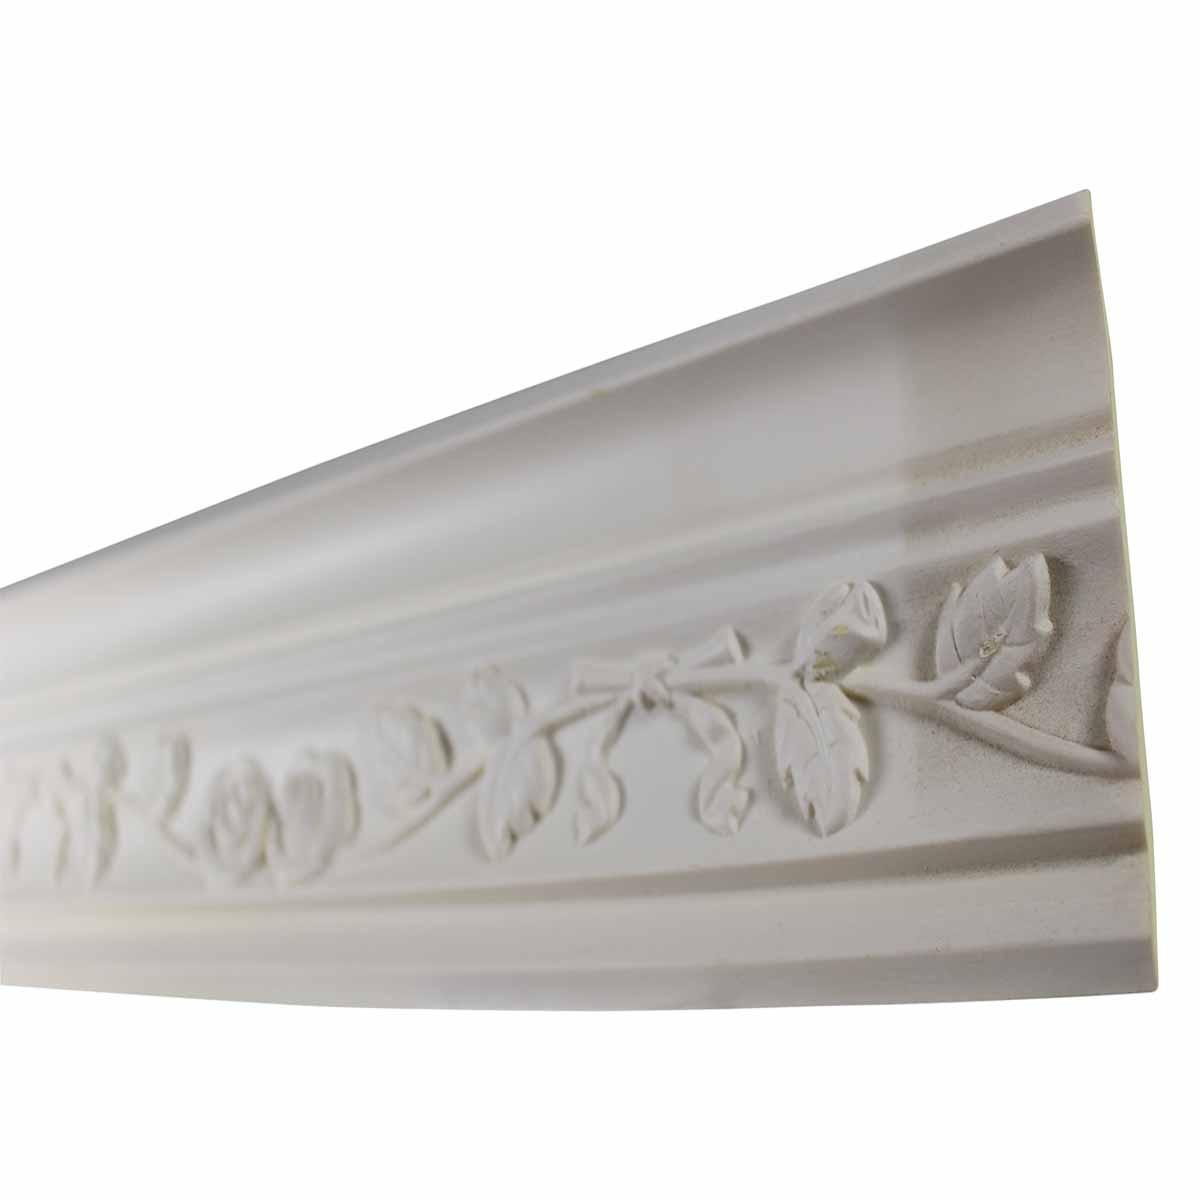 Cornice White Urethane Sample of 11187 23.5 Long Cornice Cornice Moulding Cornice Molding